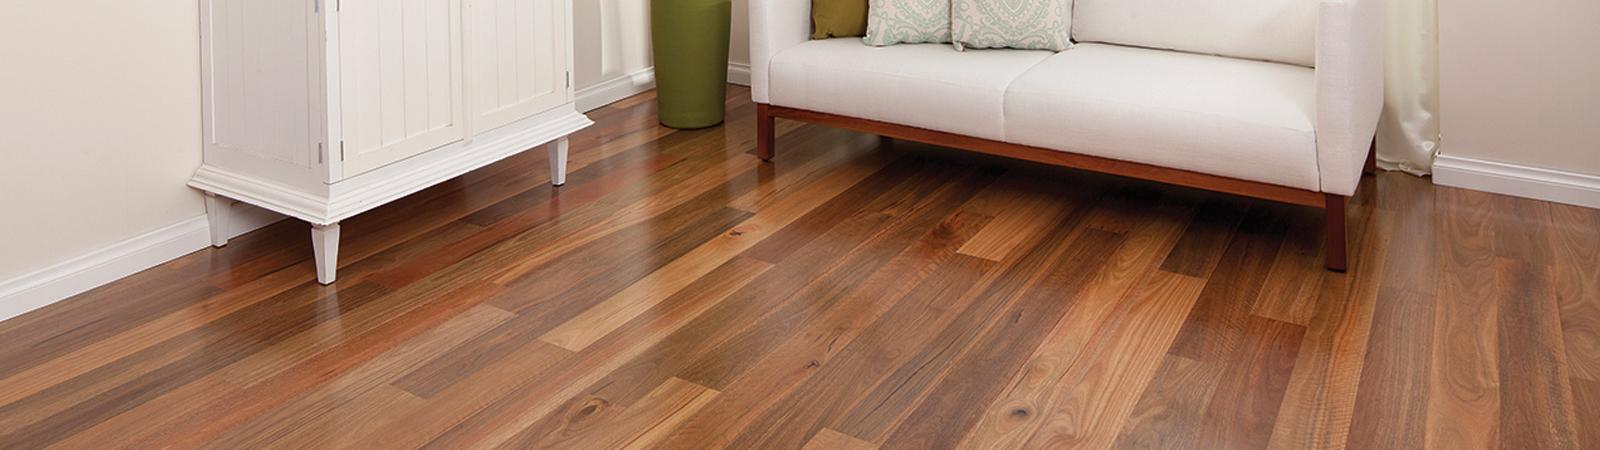 Australian Classic Timber Gloss Oakland Timber Floors